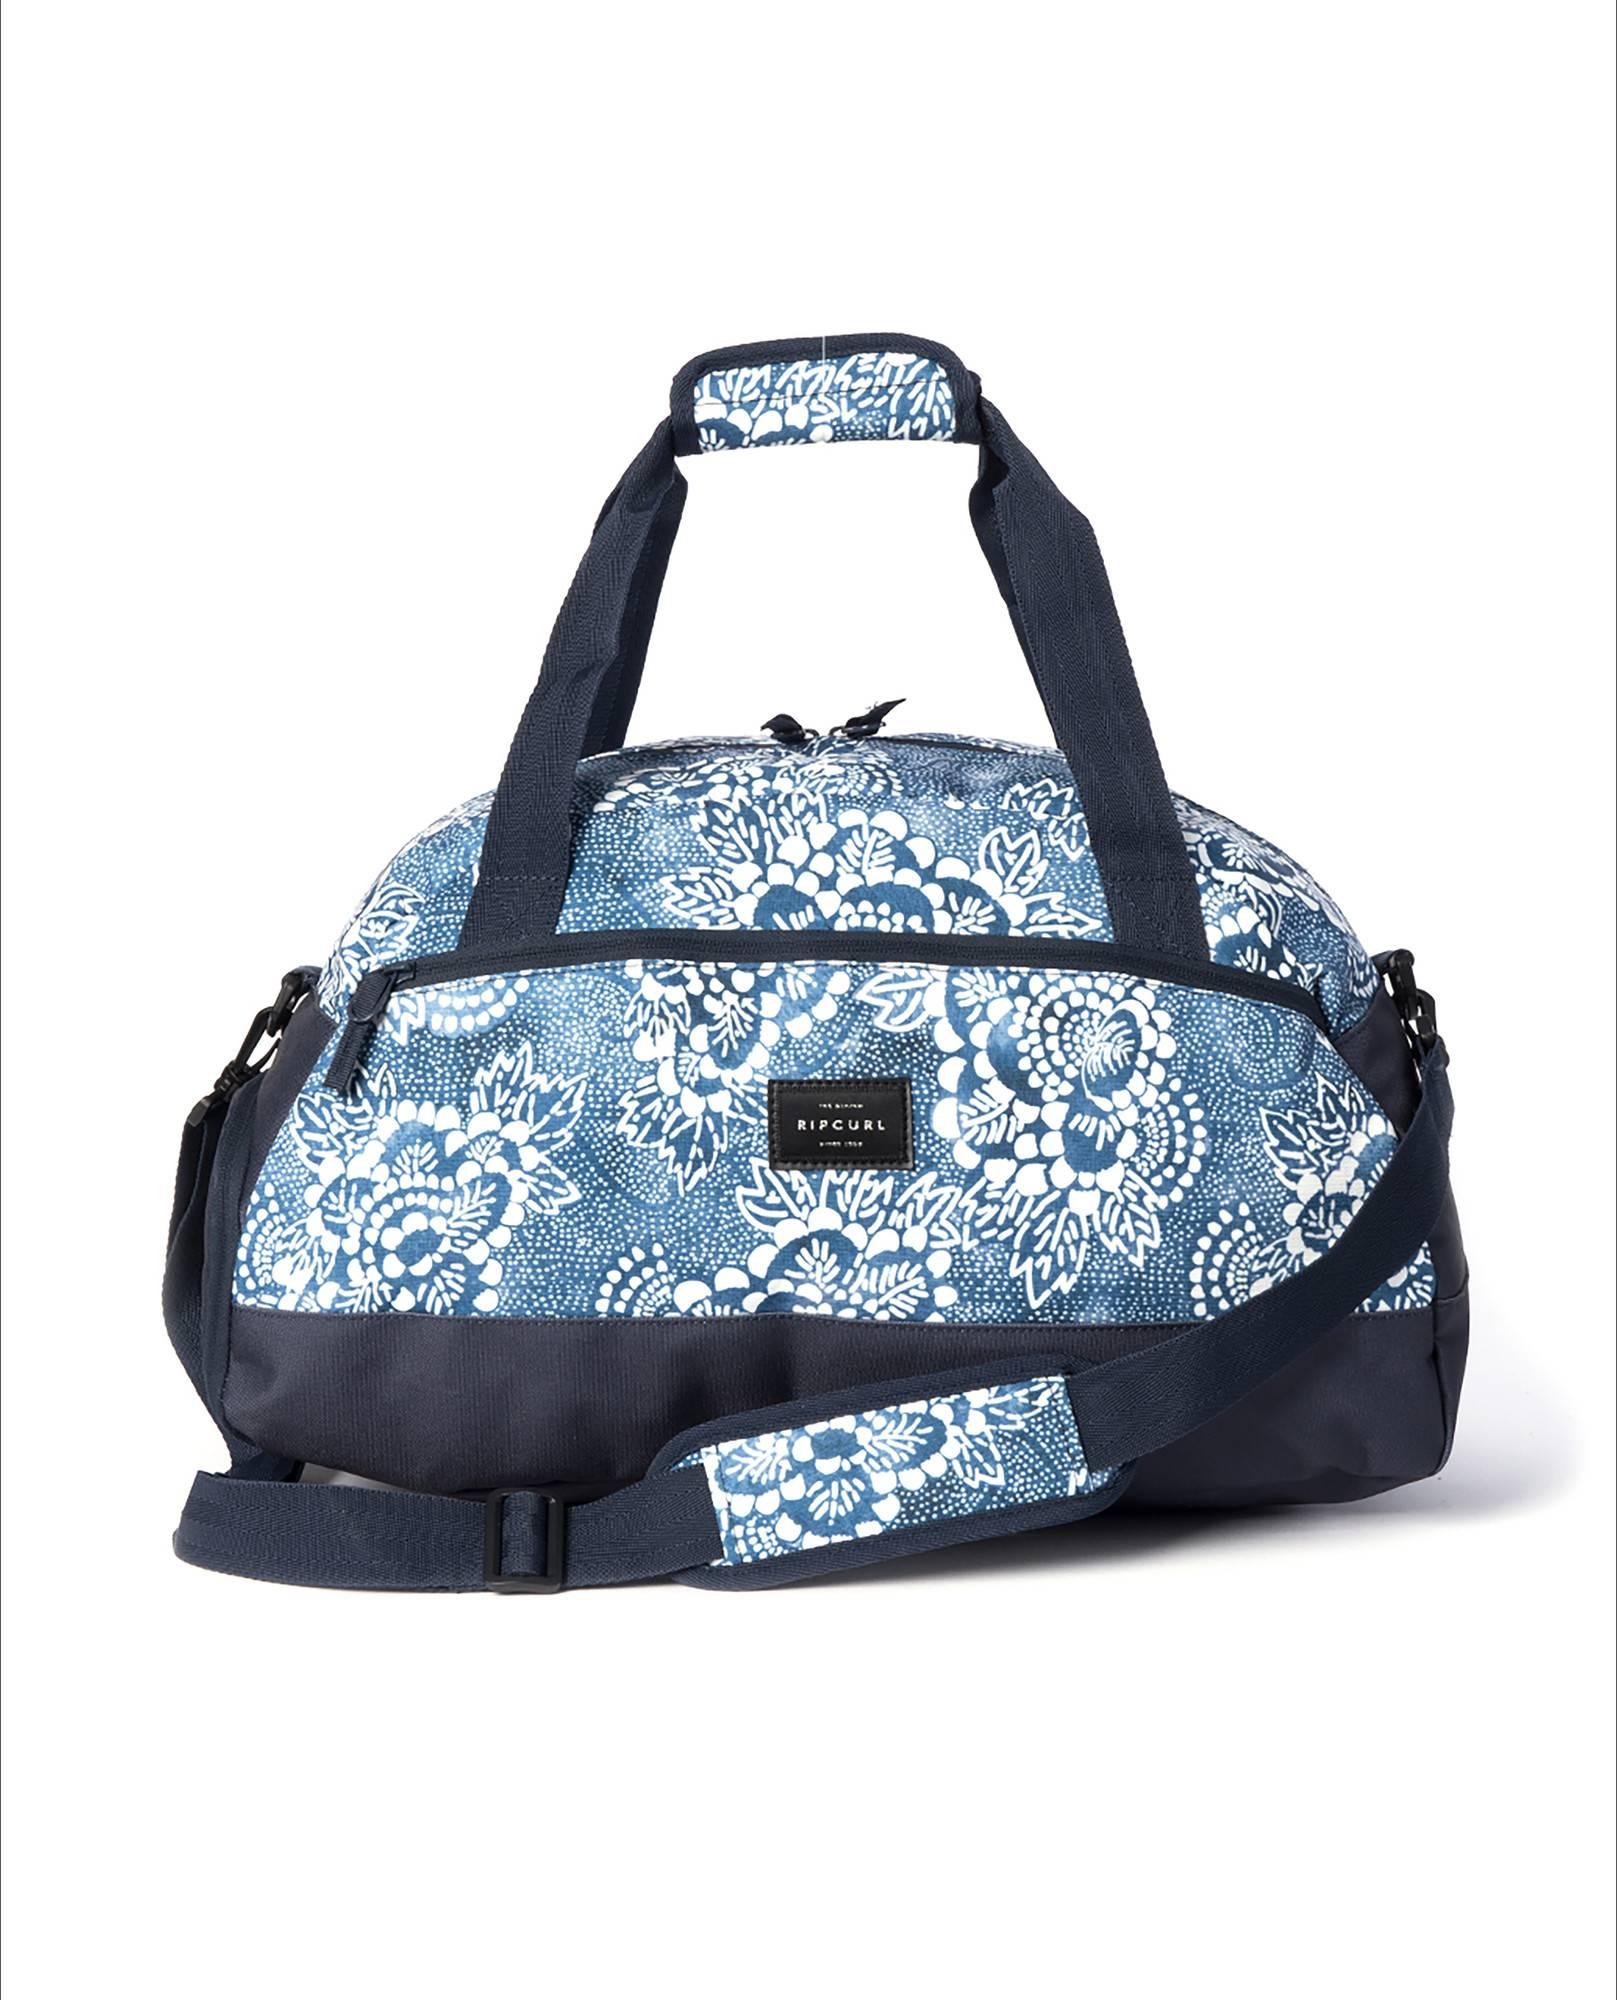 Sportovní taška dásmká RIP CURL GYM BAG COASTAL VIEW 36L